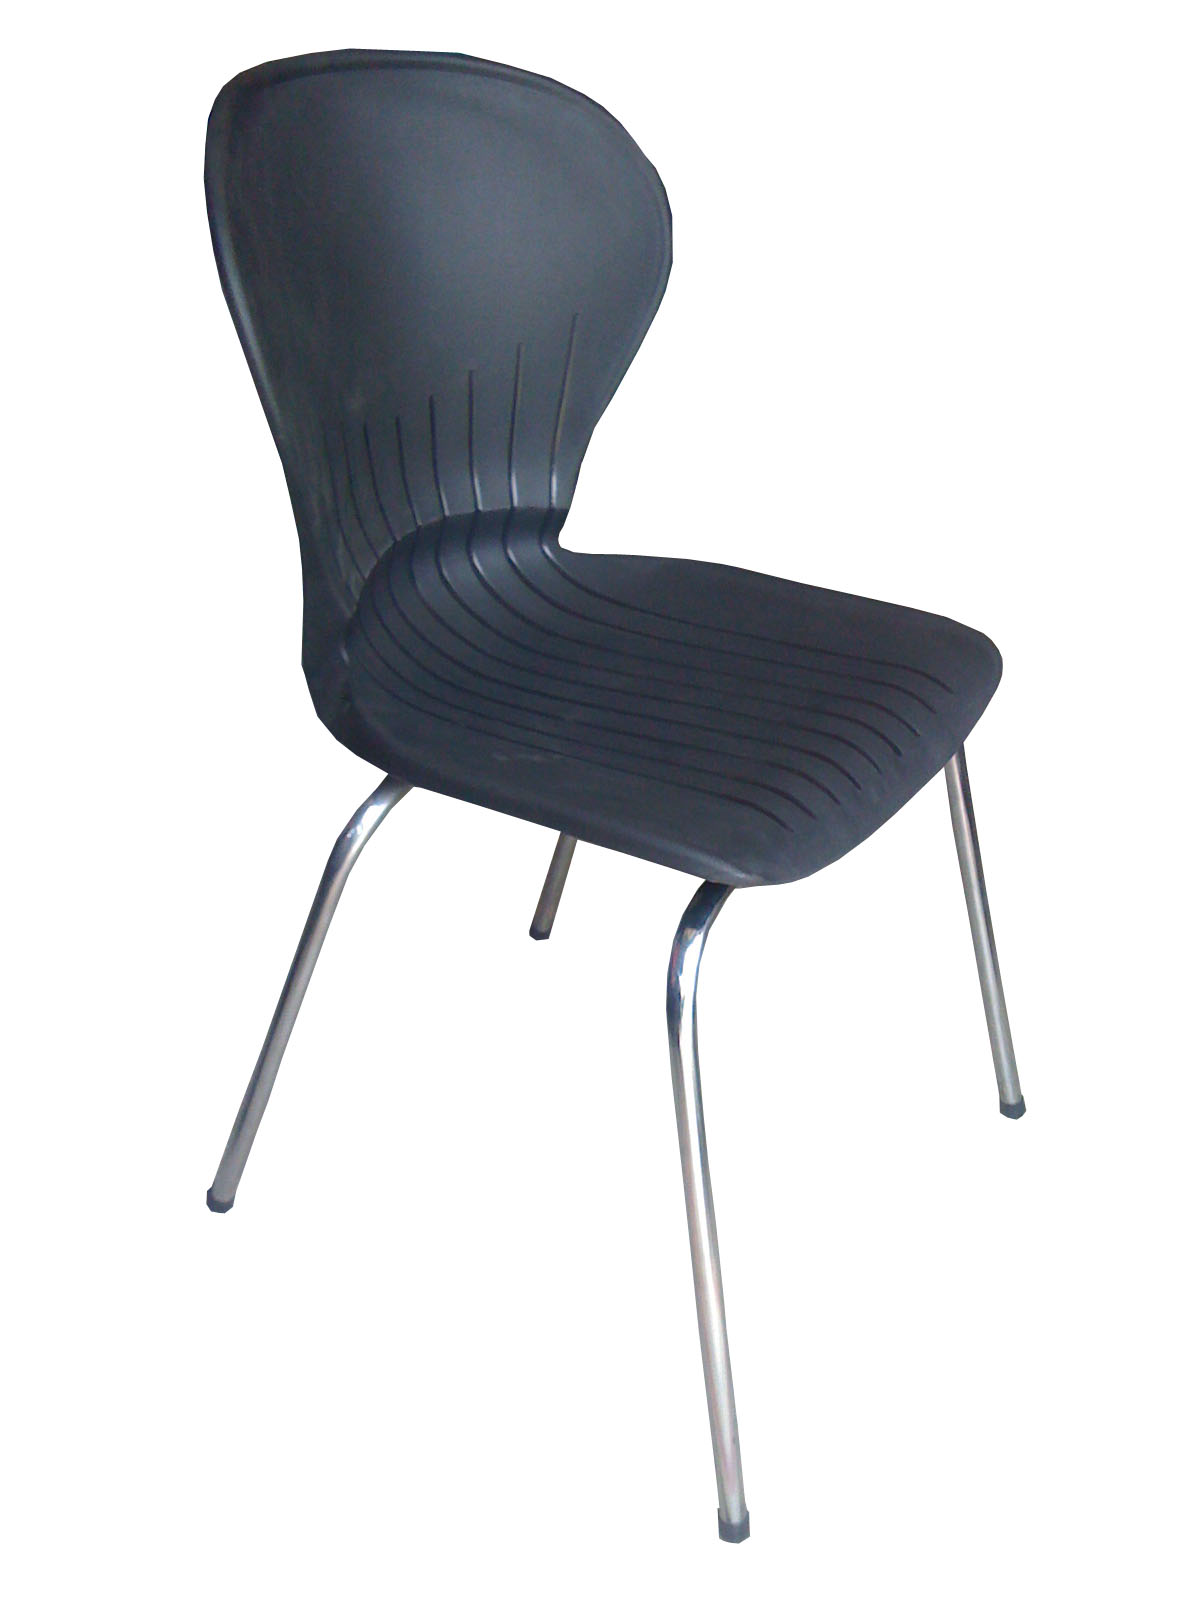 Muebles bogota muebles oficina sillas archivadores for Silla interlocutora